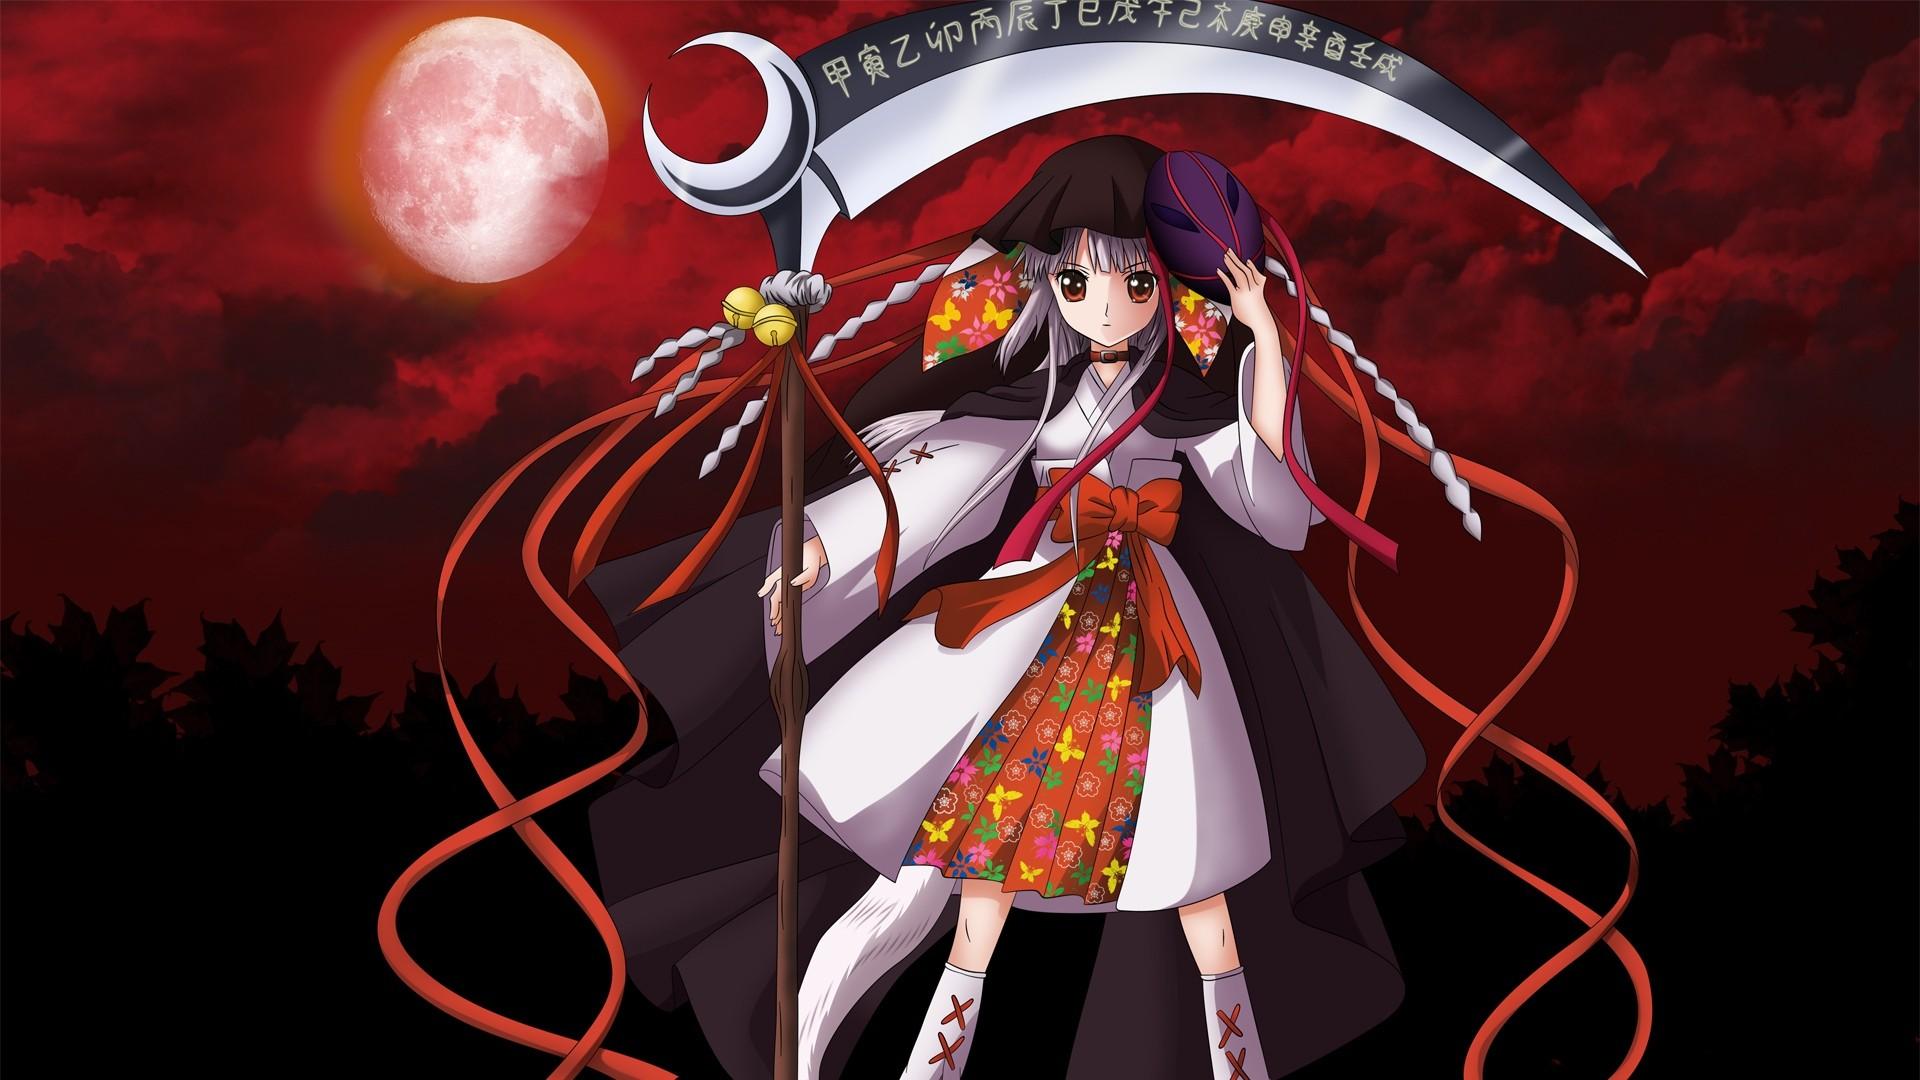 Wallpaper illustration anime girls weapon scythe - Anime girl with weapon ...